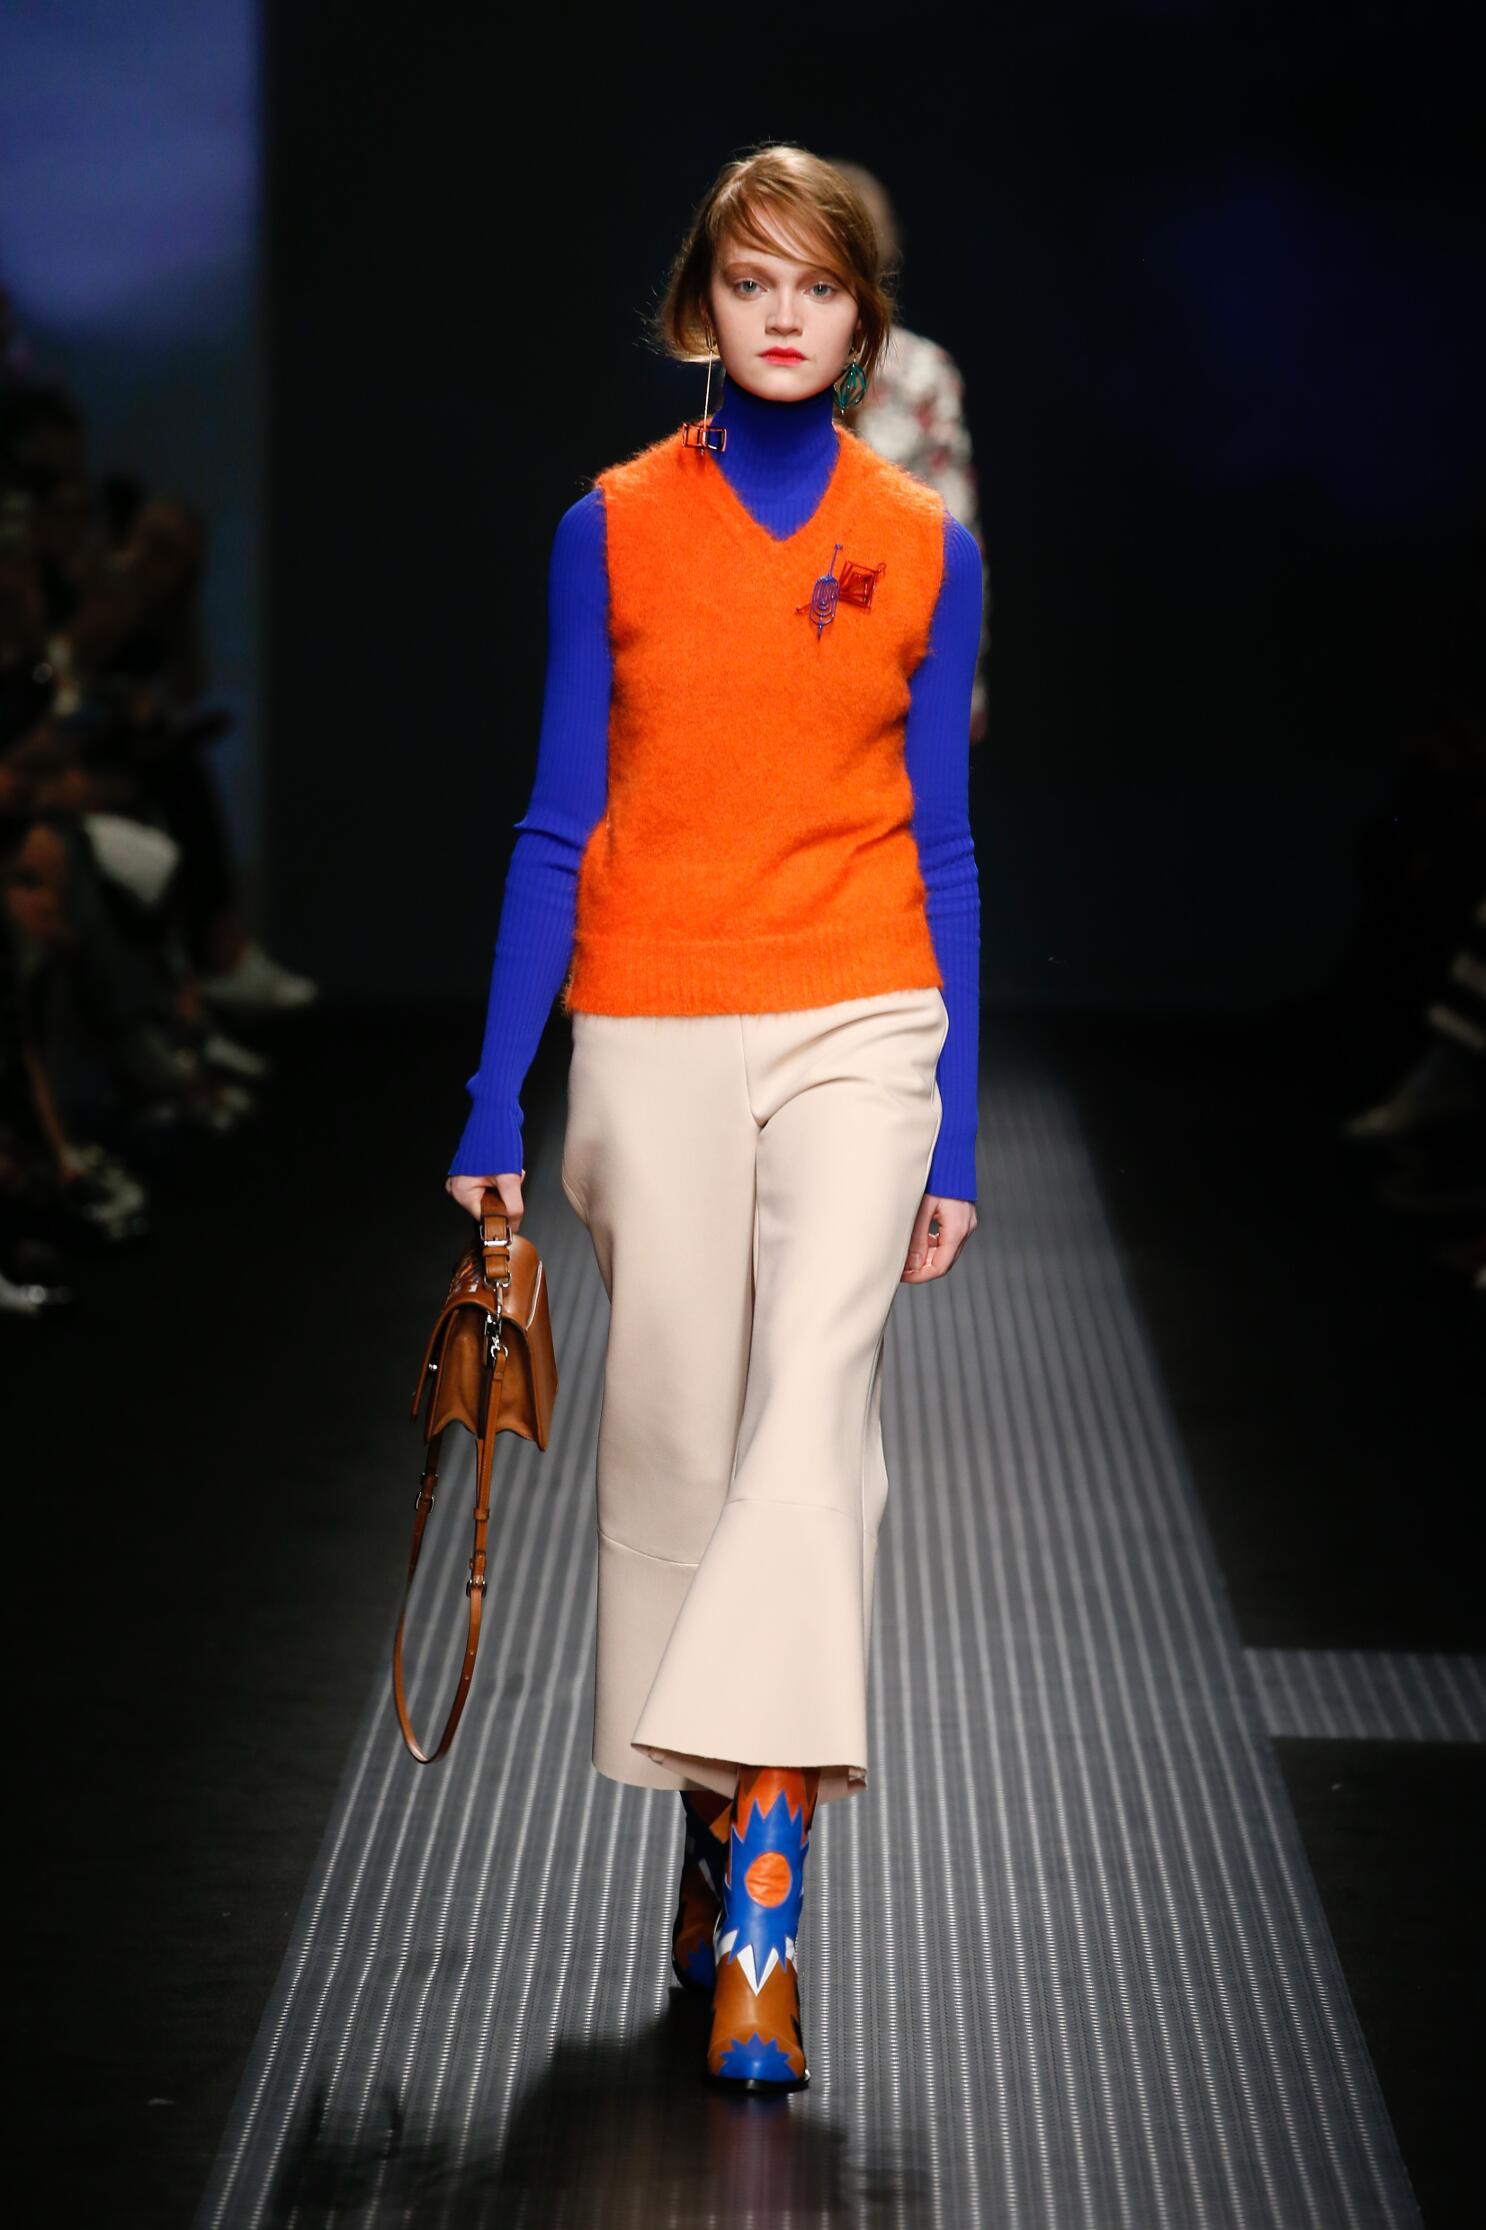 Fashion Woman Model Msgm Collection Catwalk